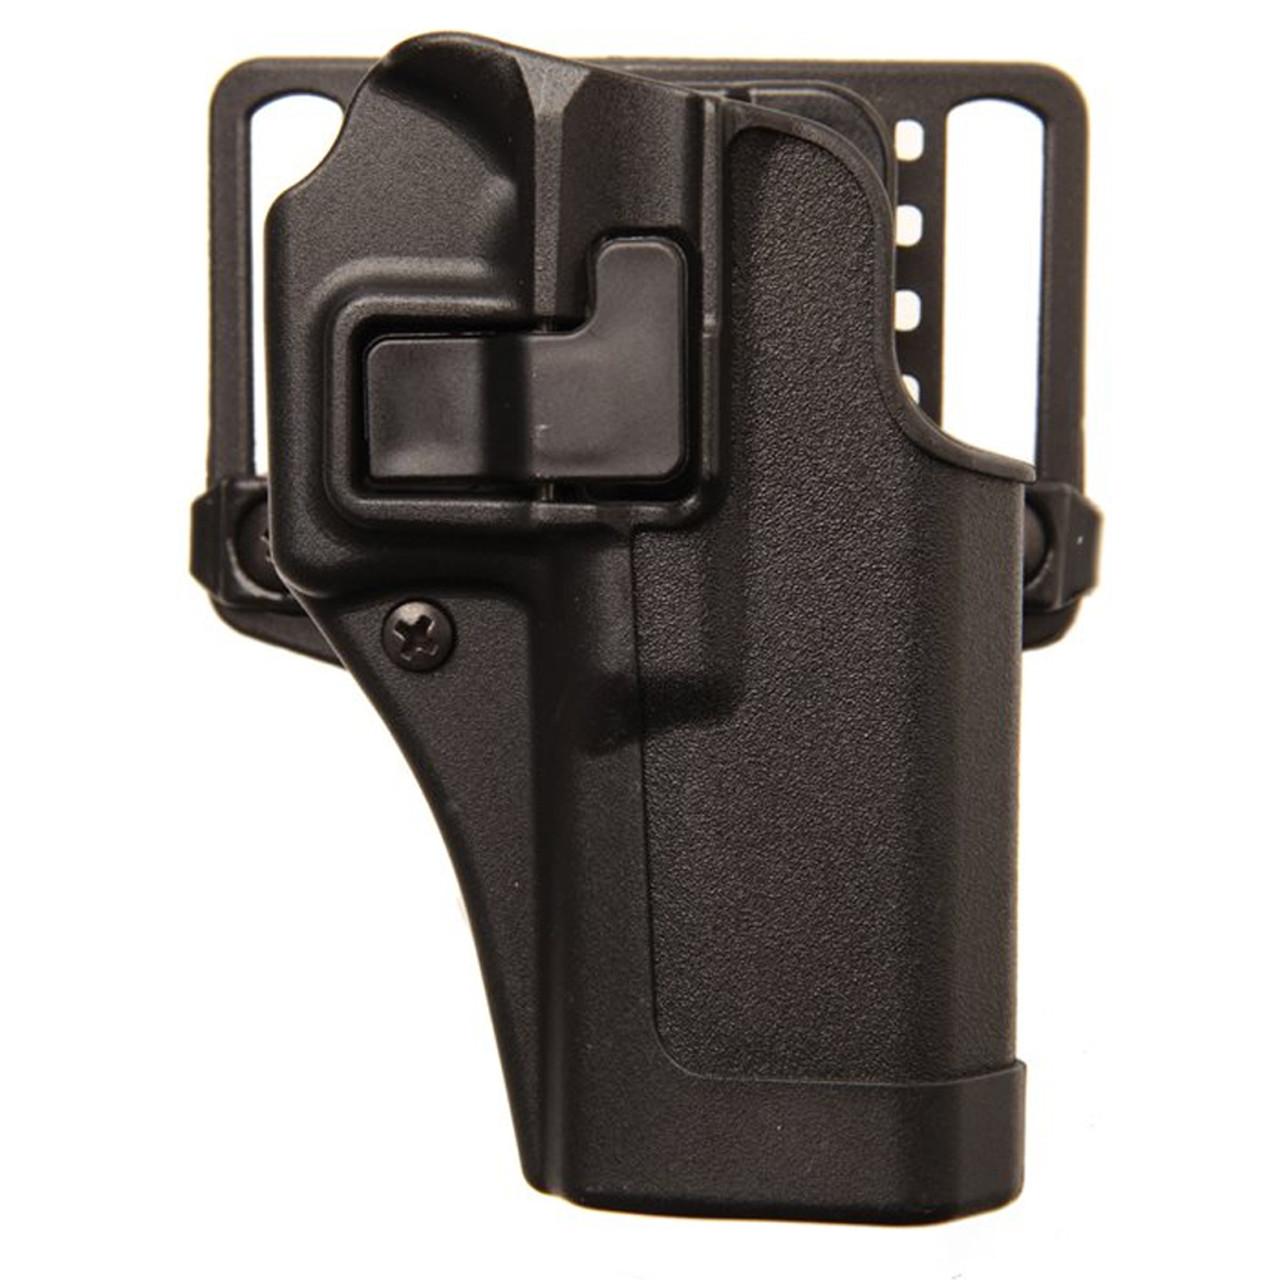 Blackhawk SERPA CQC Concealment Holster, Glock 43, Right Hand